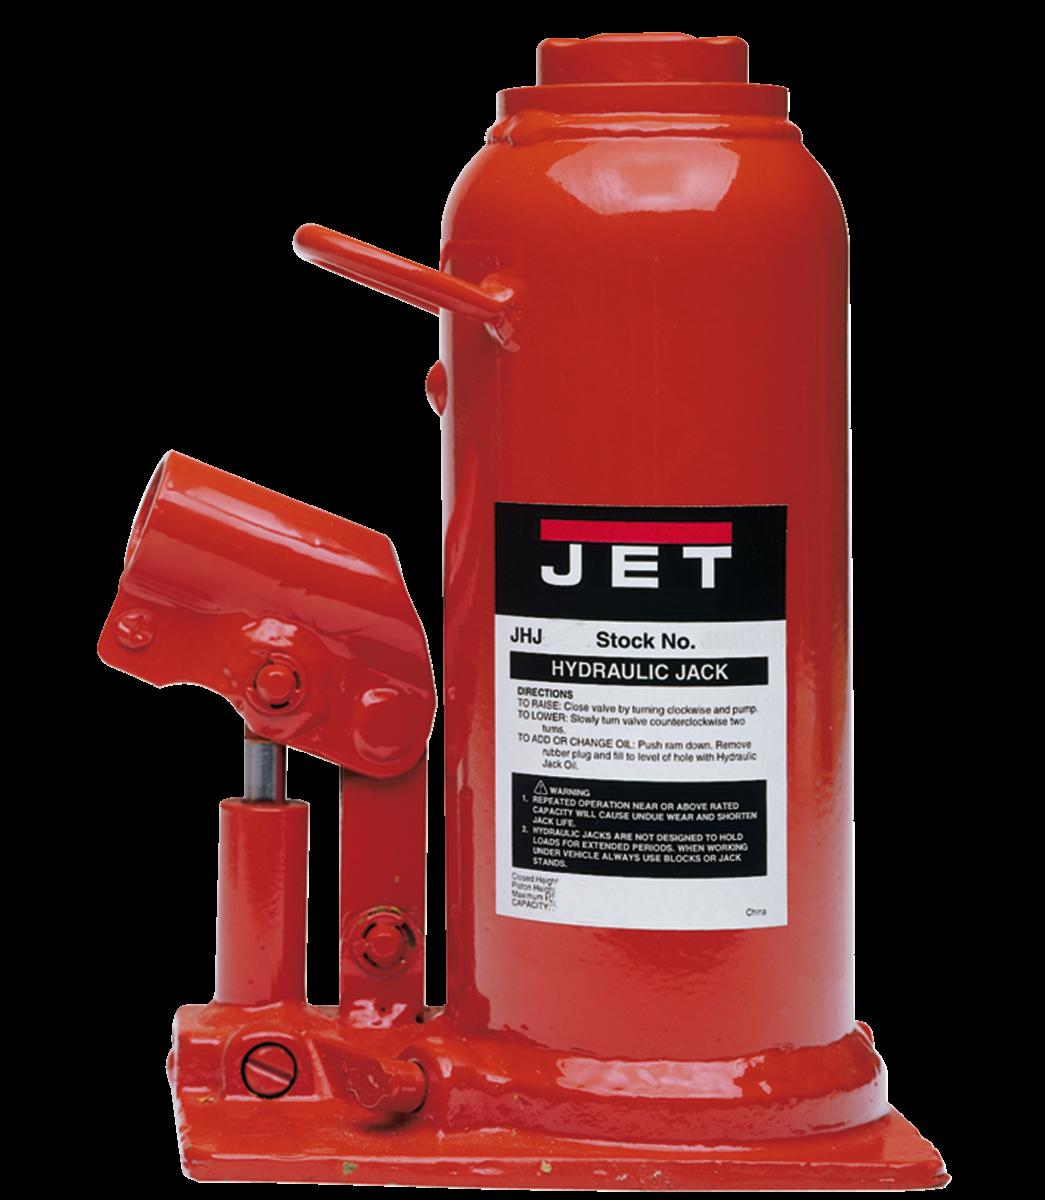 JHJ-2, 2-Ton Hydraulic Bottle Jack